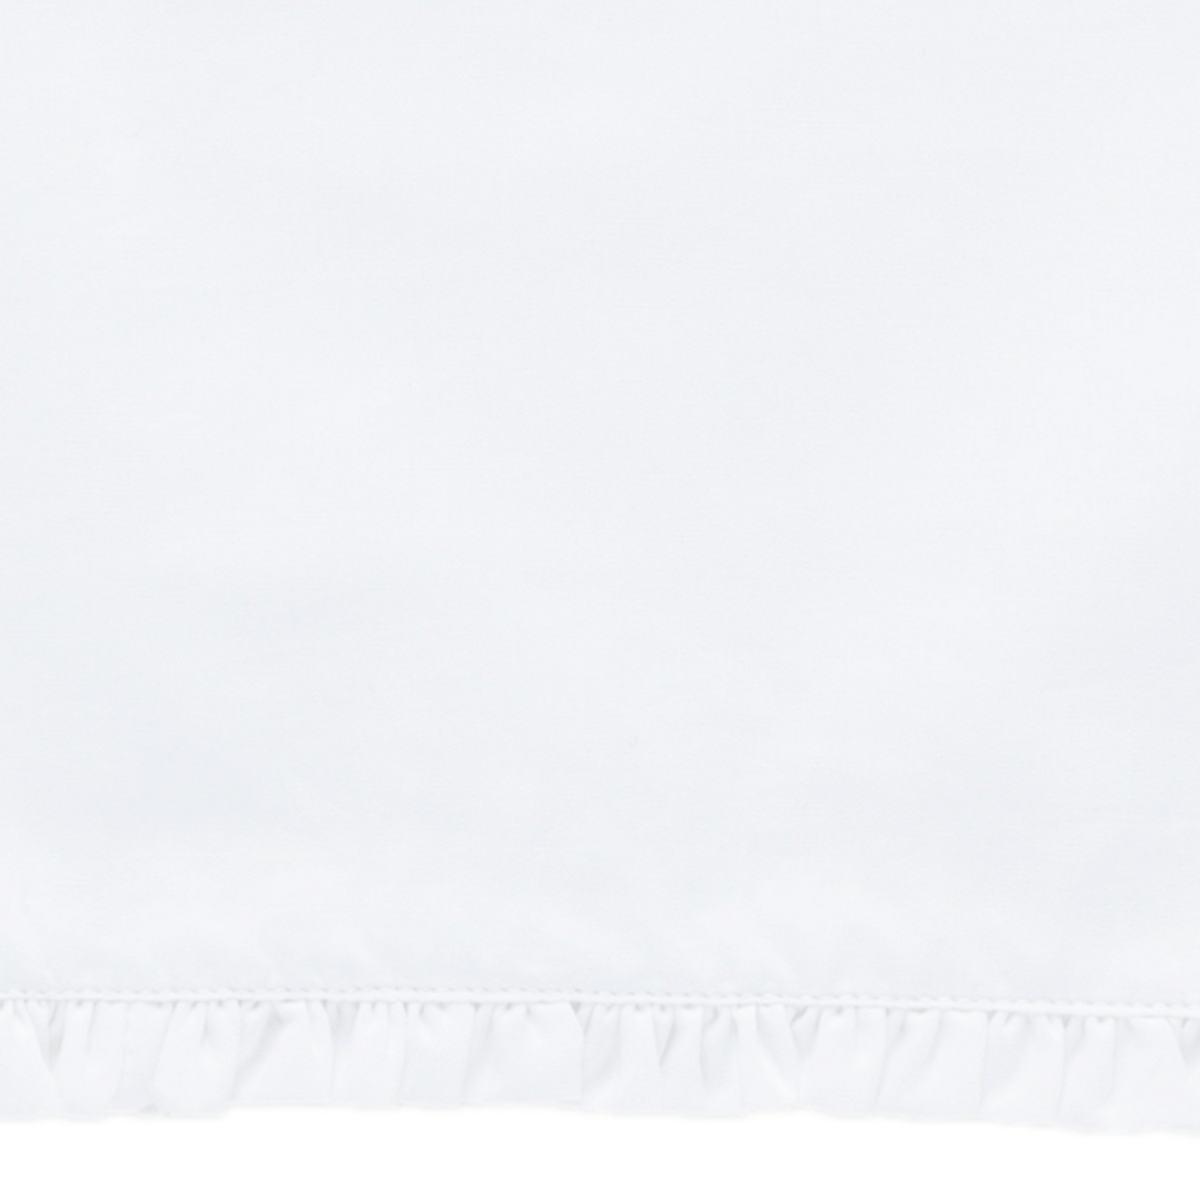 Petite Ruffle White Sheet Swatch